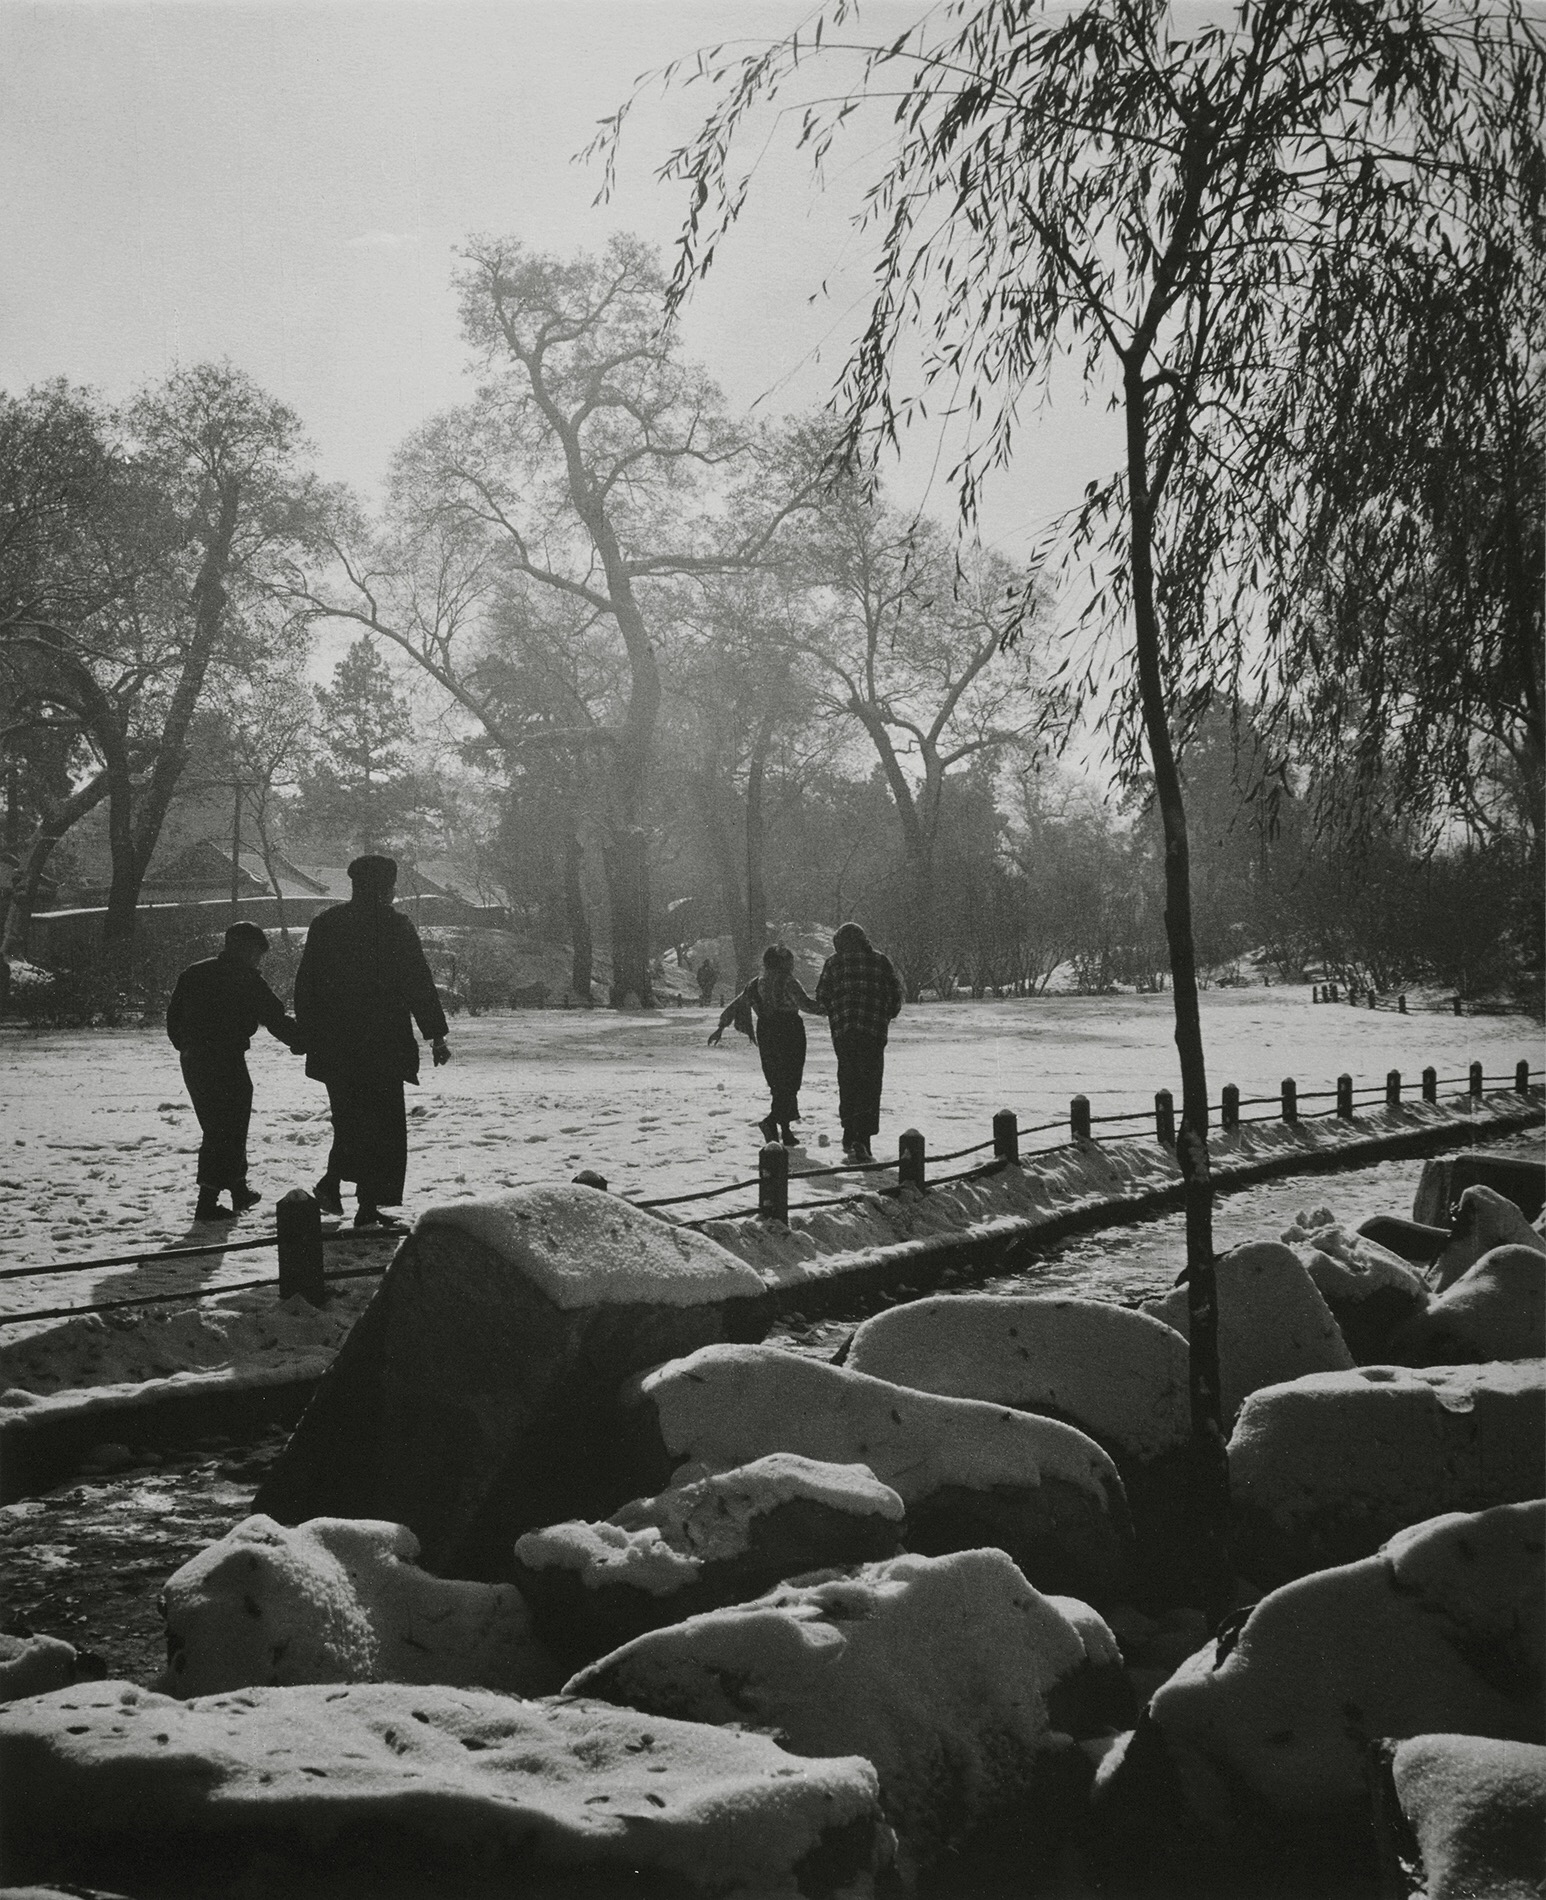 xue-zijiang-china-1950s-photography-of-china-5.jpeg